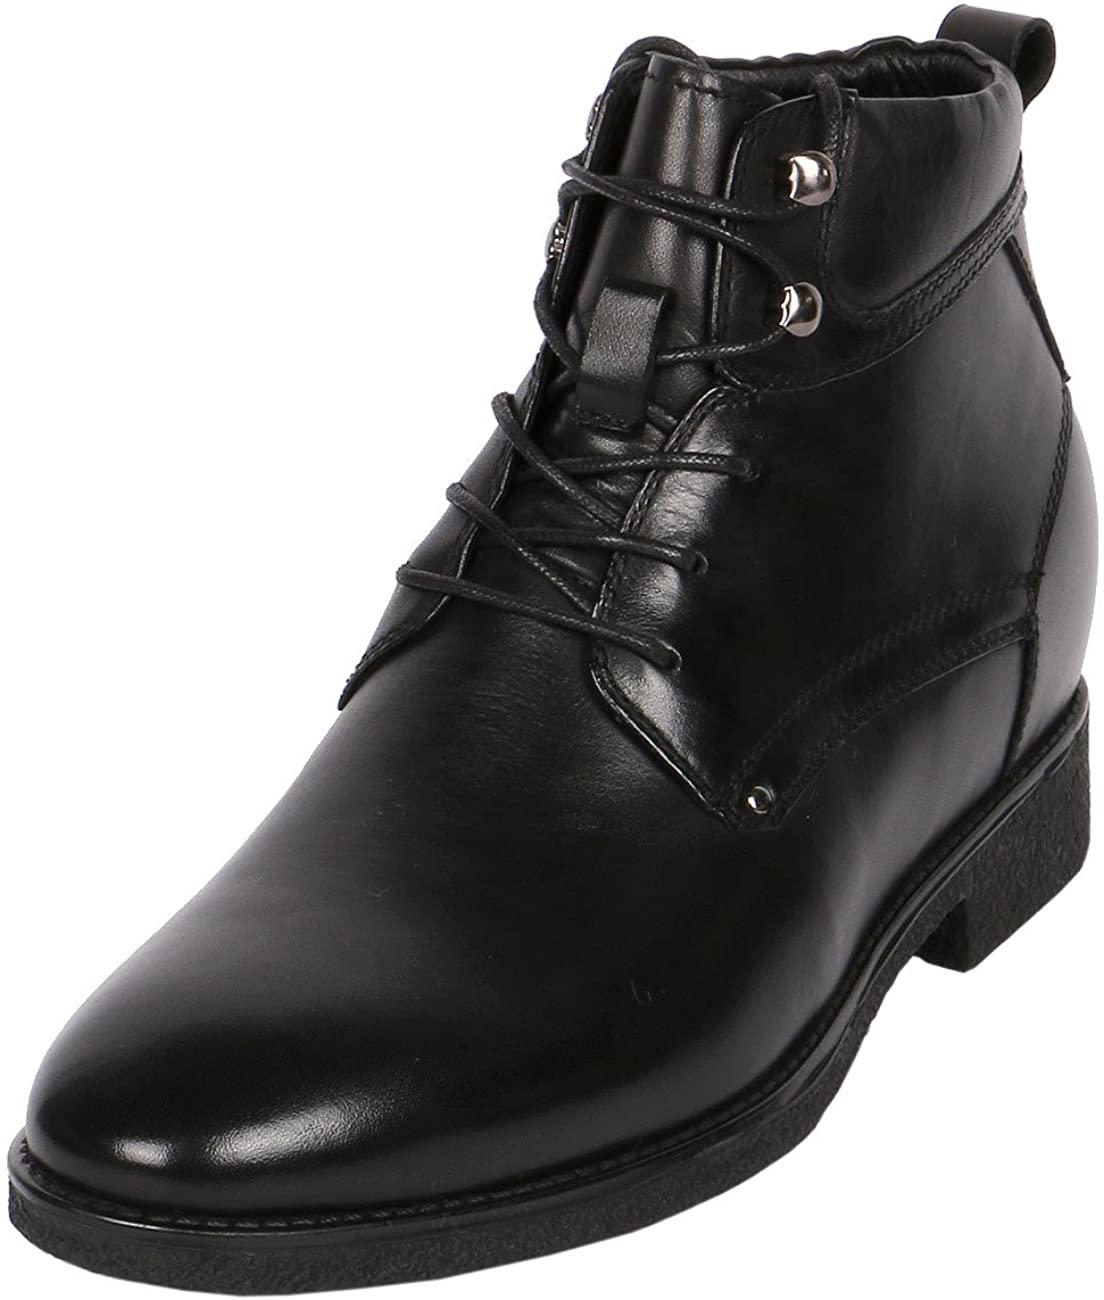 JOTA Goods for Tall Men Dress Wraparound Ankle Boots 3